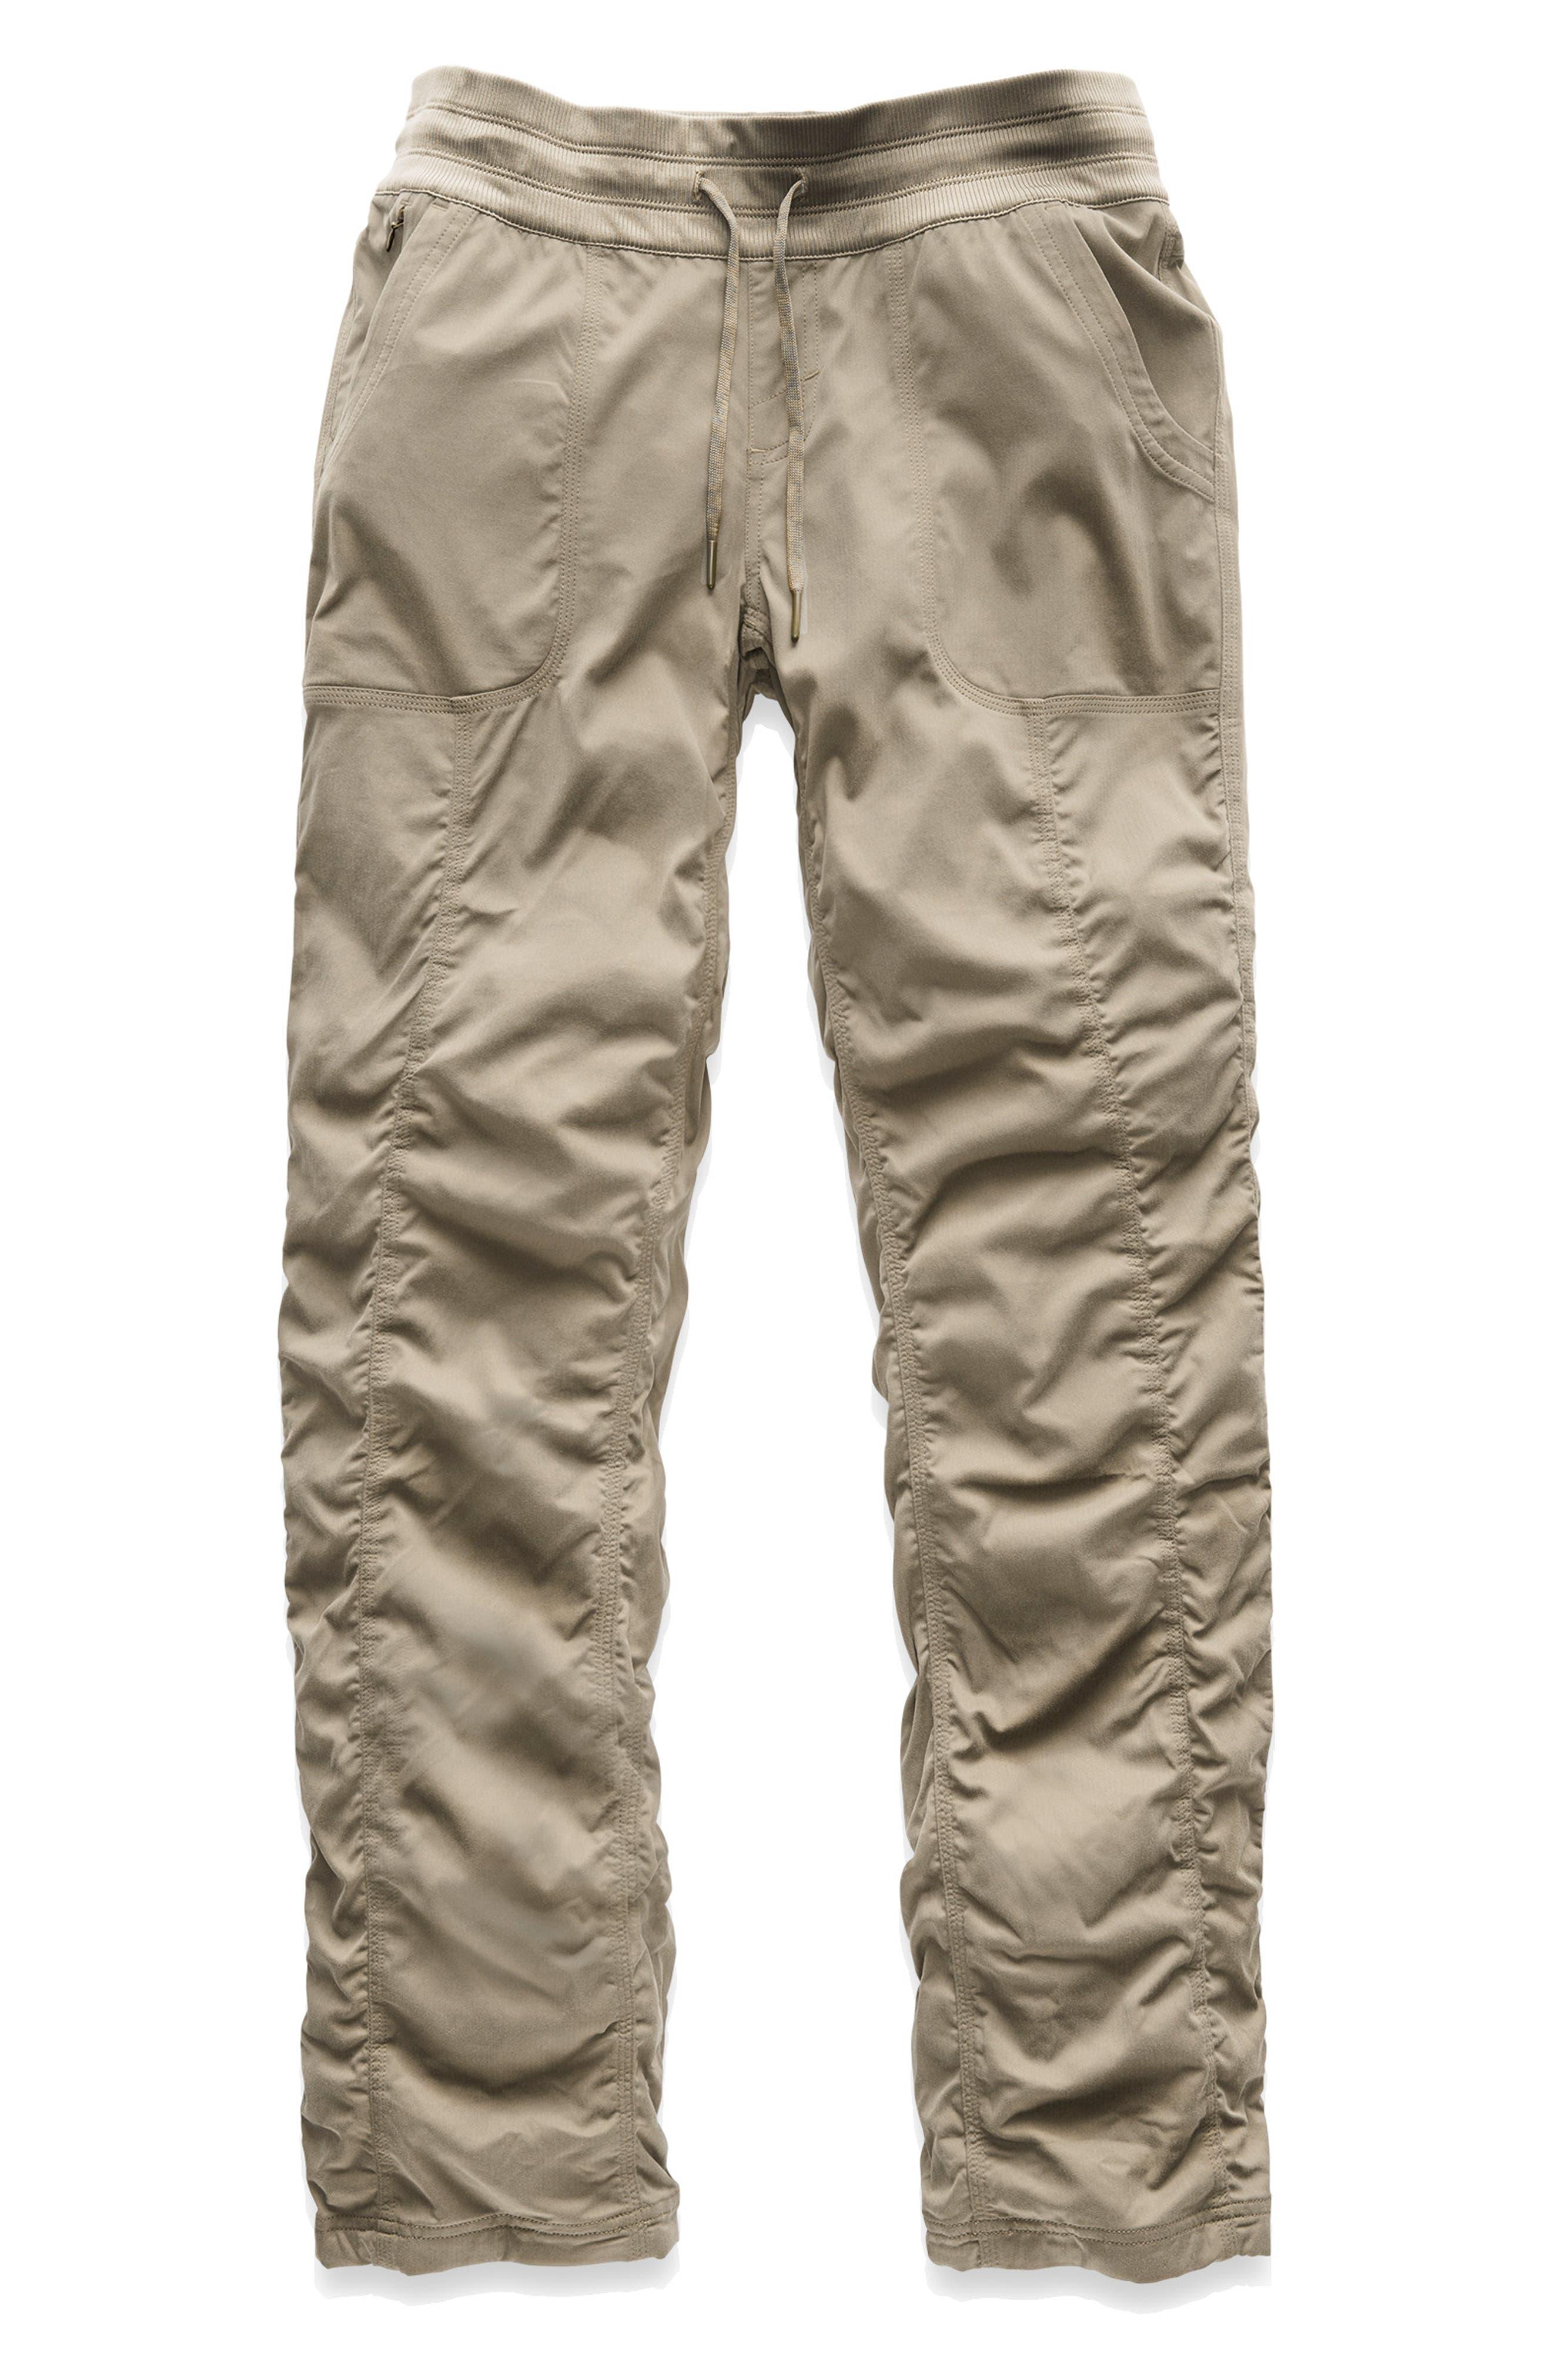 The North Face Pants Aphrodite 2.0 Pants